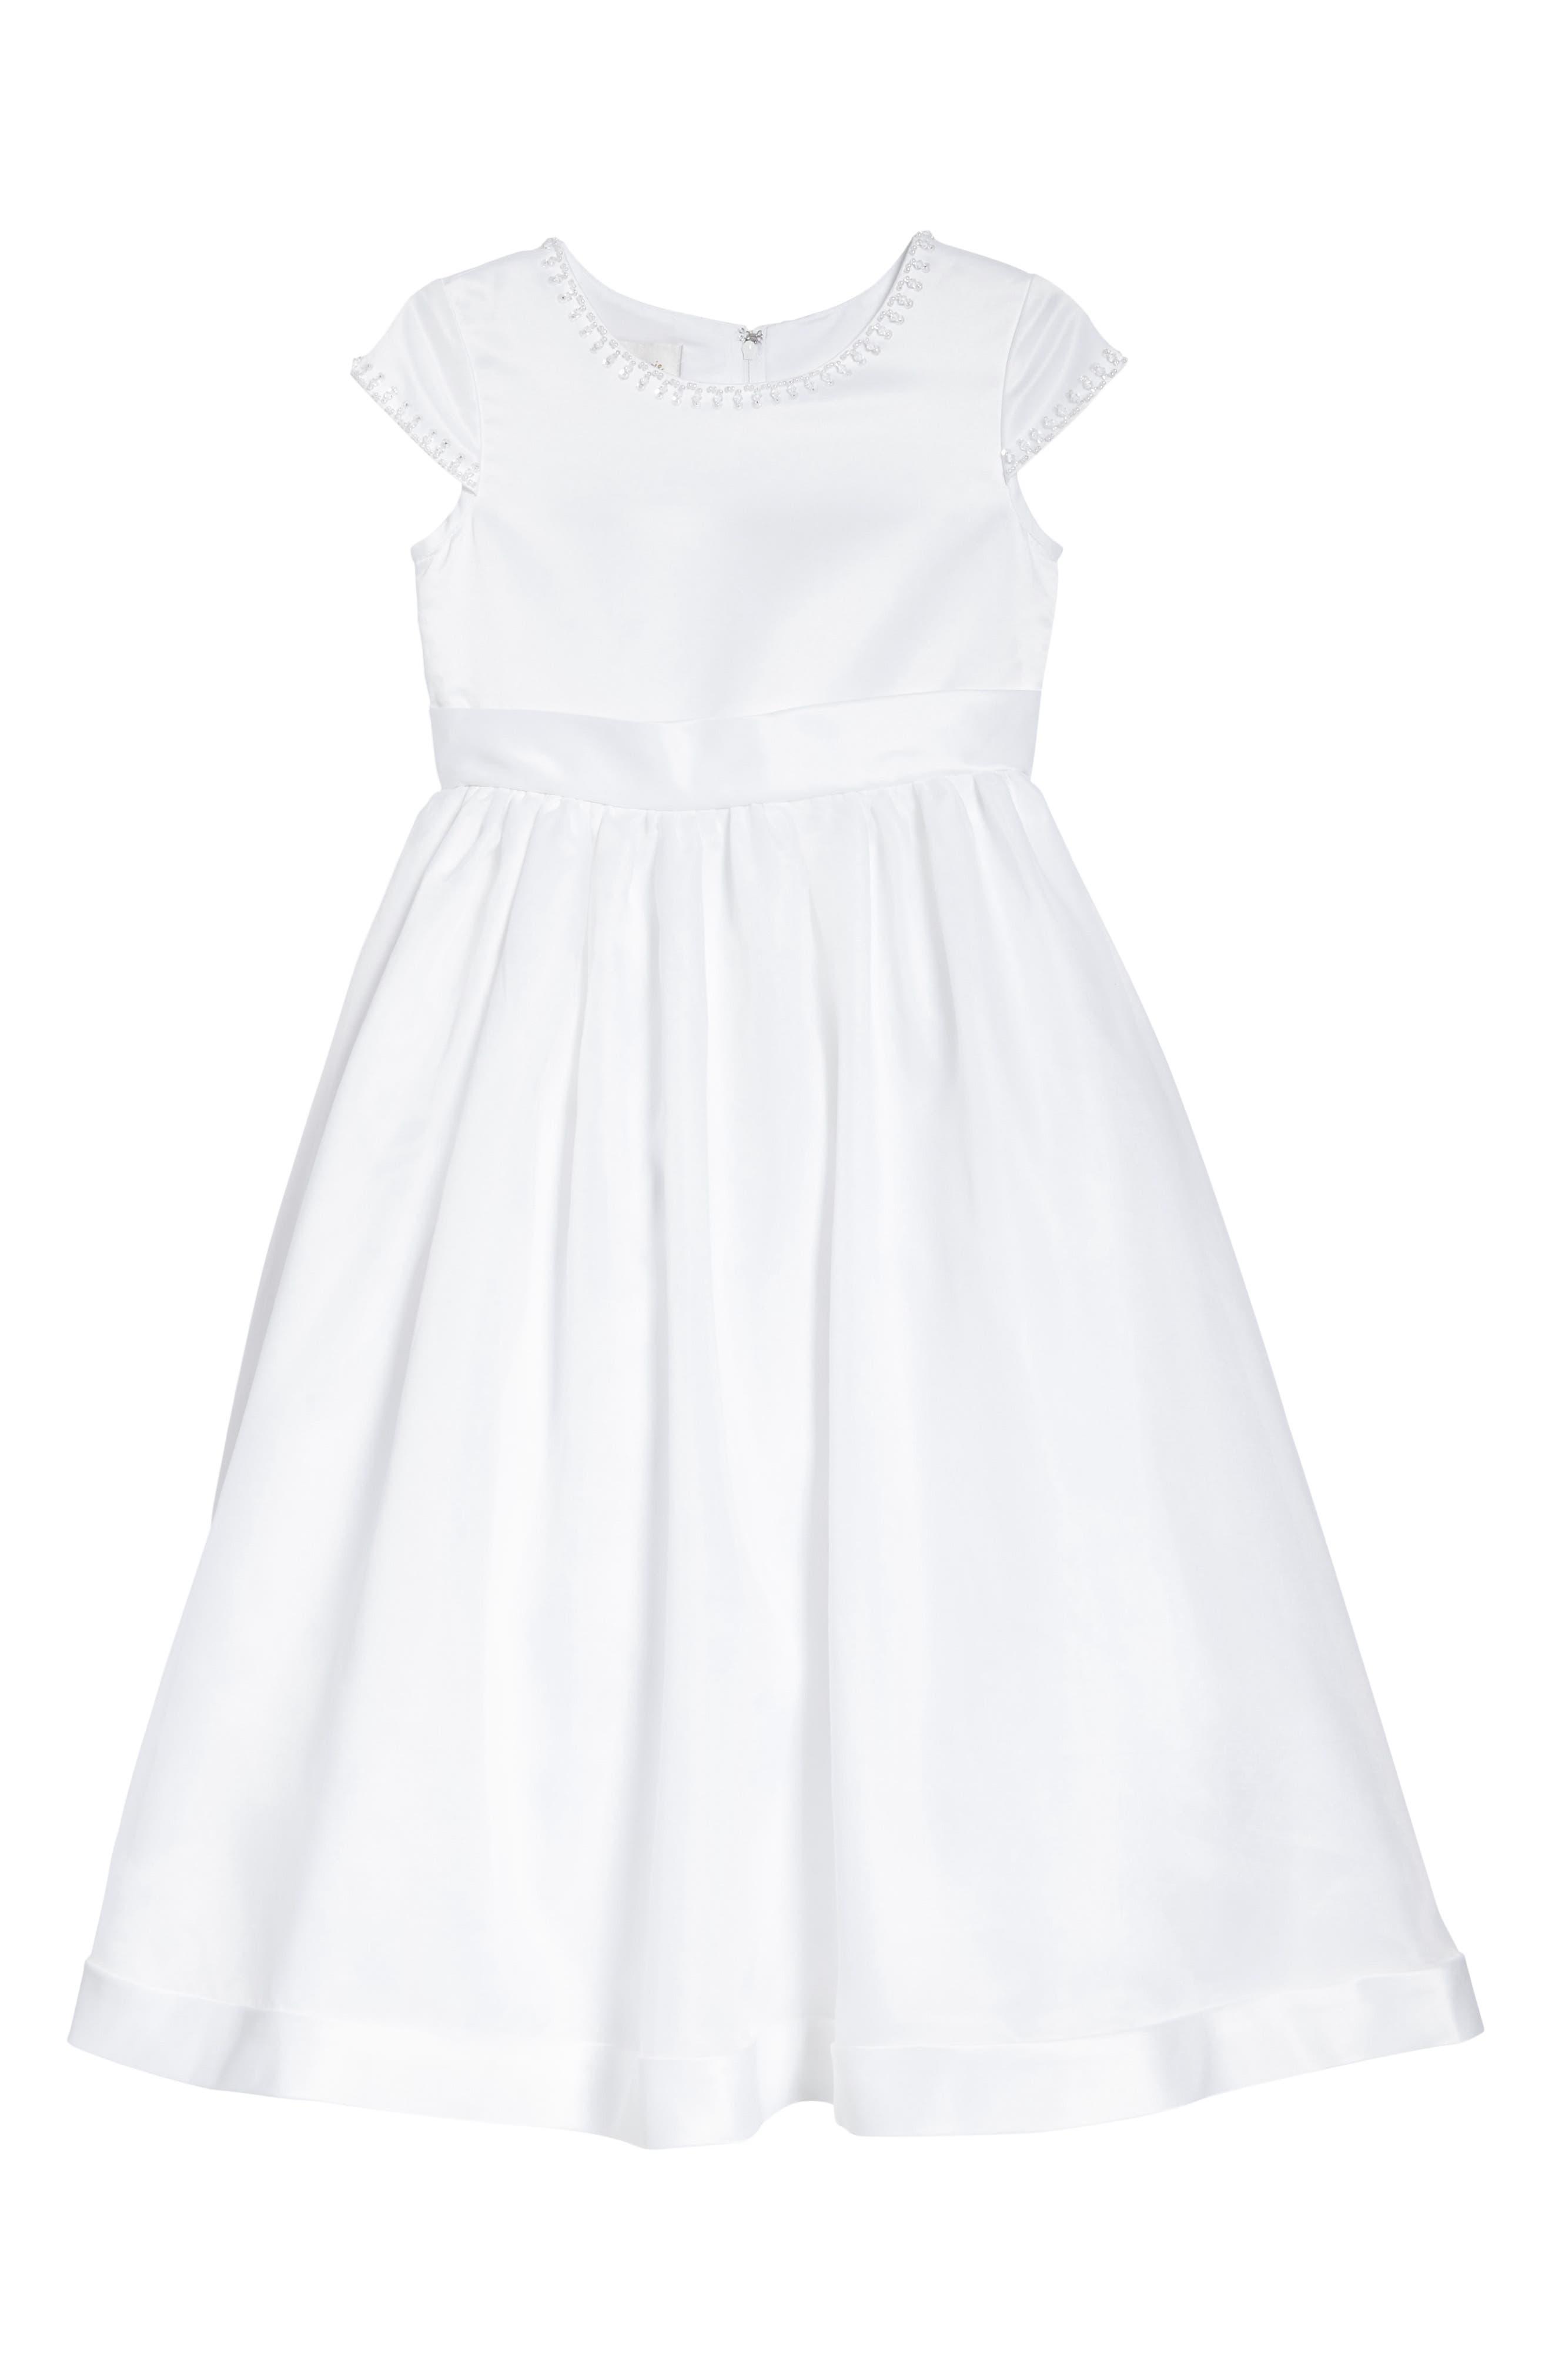 Main Image - Lauren Marie Beaded Cap Sleeve Dress (Little Girls & Big Girls)